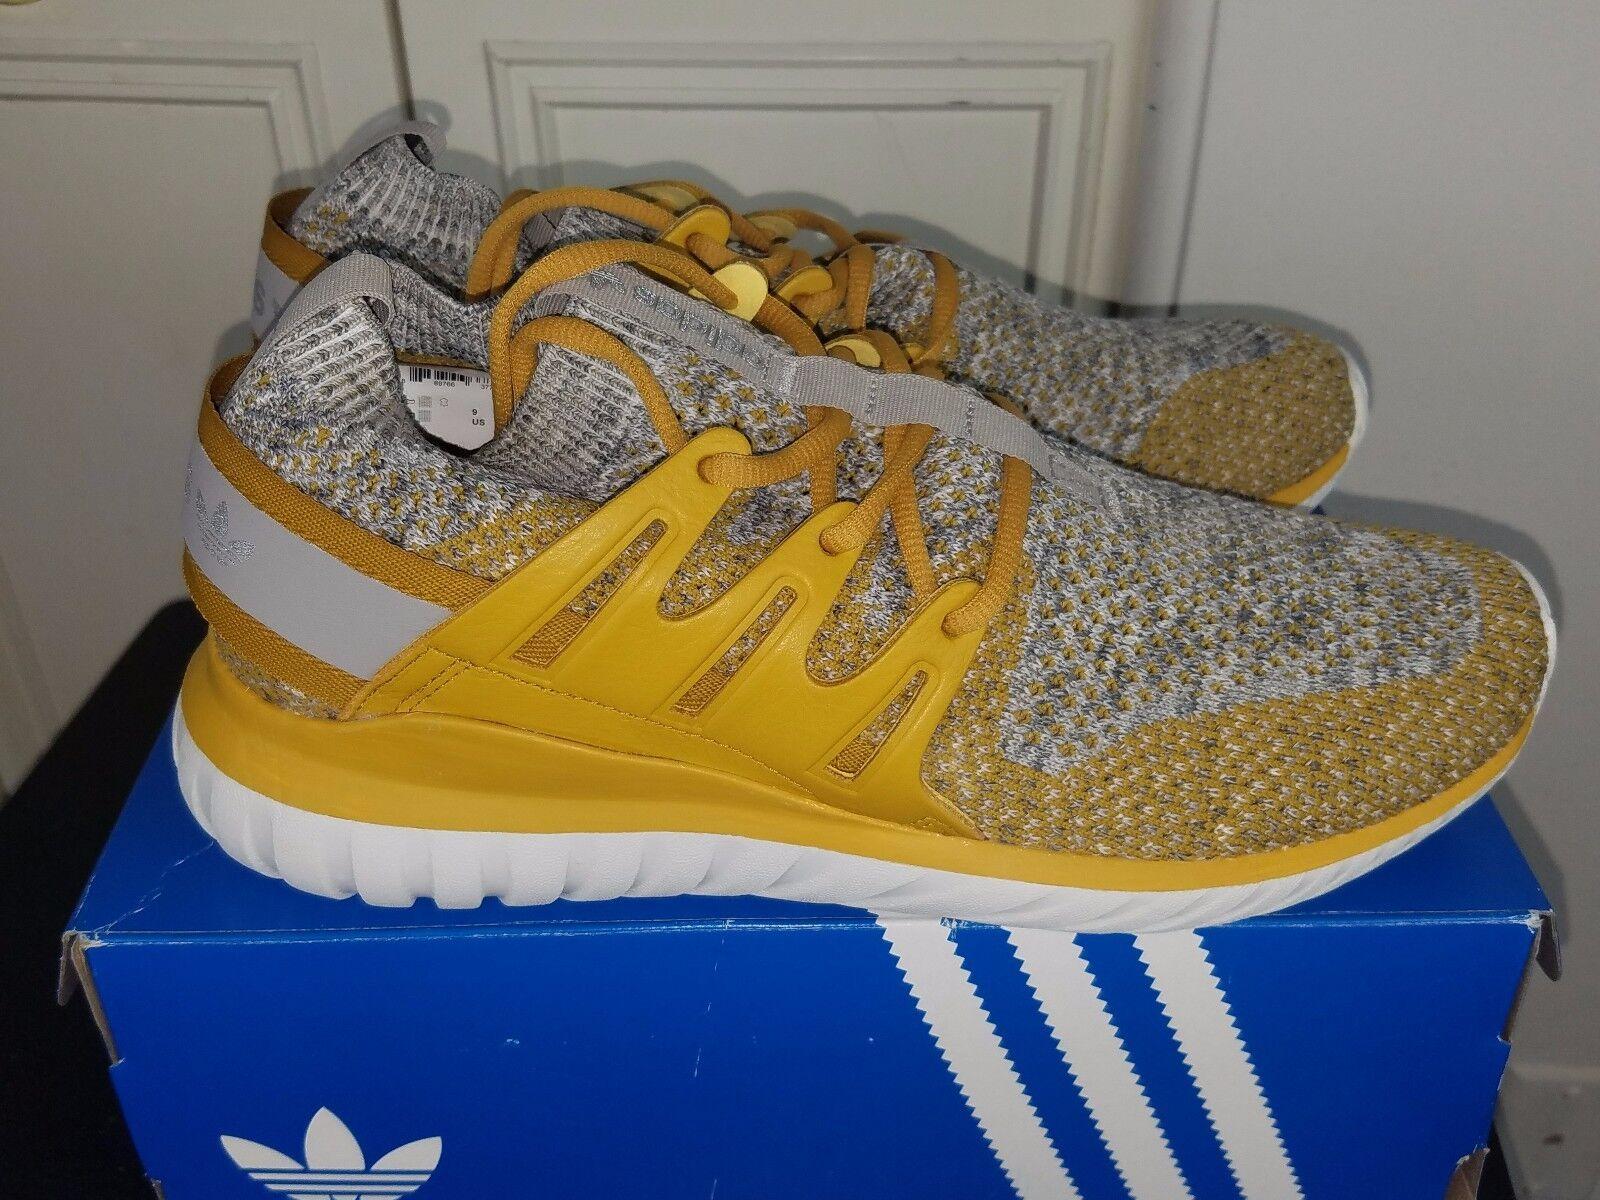 Männer adidas tubuläre nova pk primeknit bb8407 bb8407 bb8407 stein gelbe granit schuhe sneaker 208465